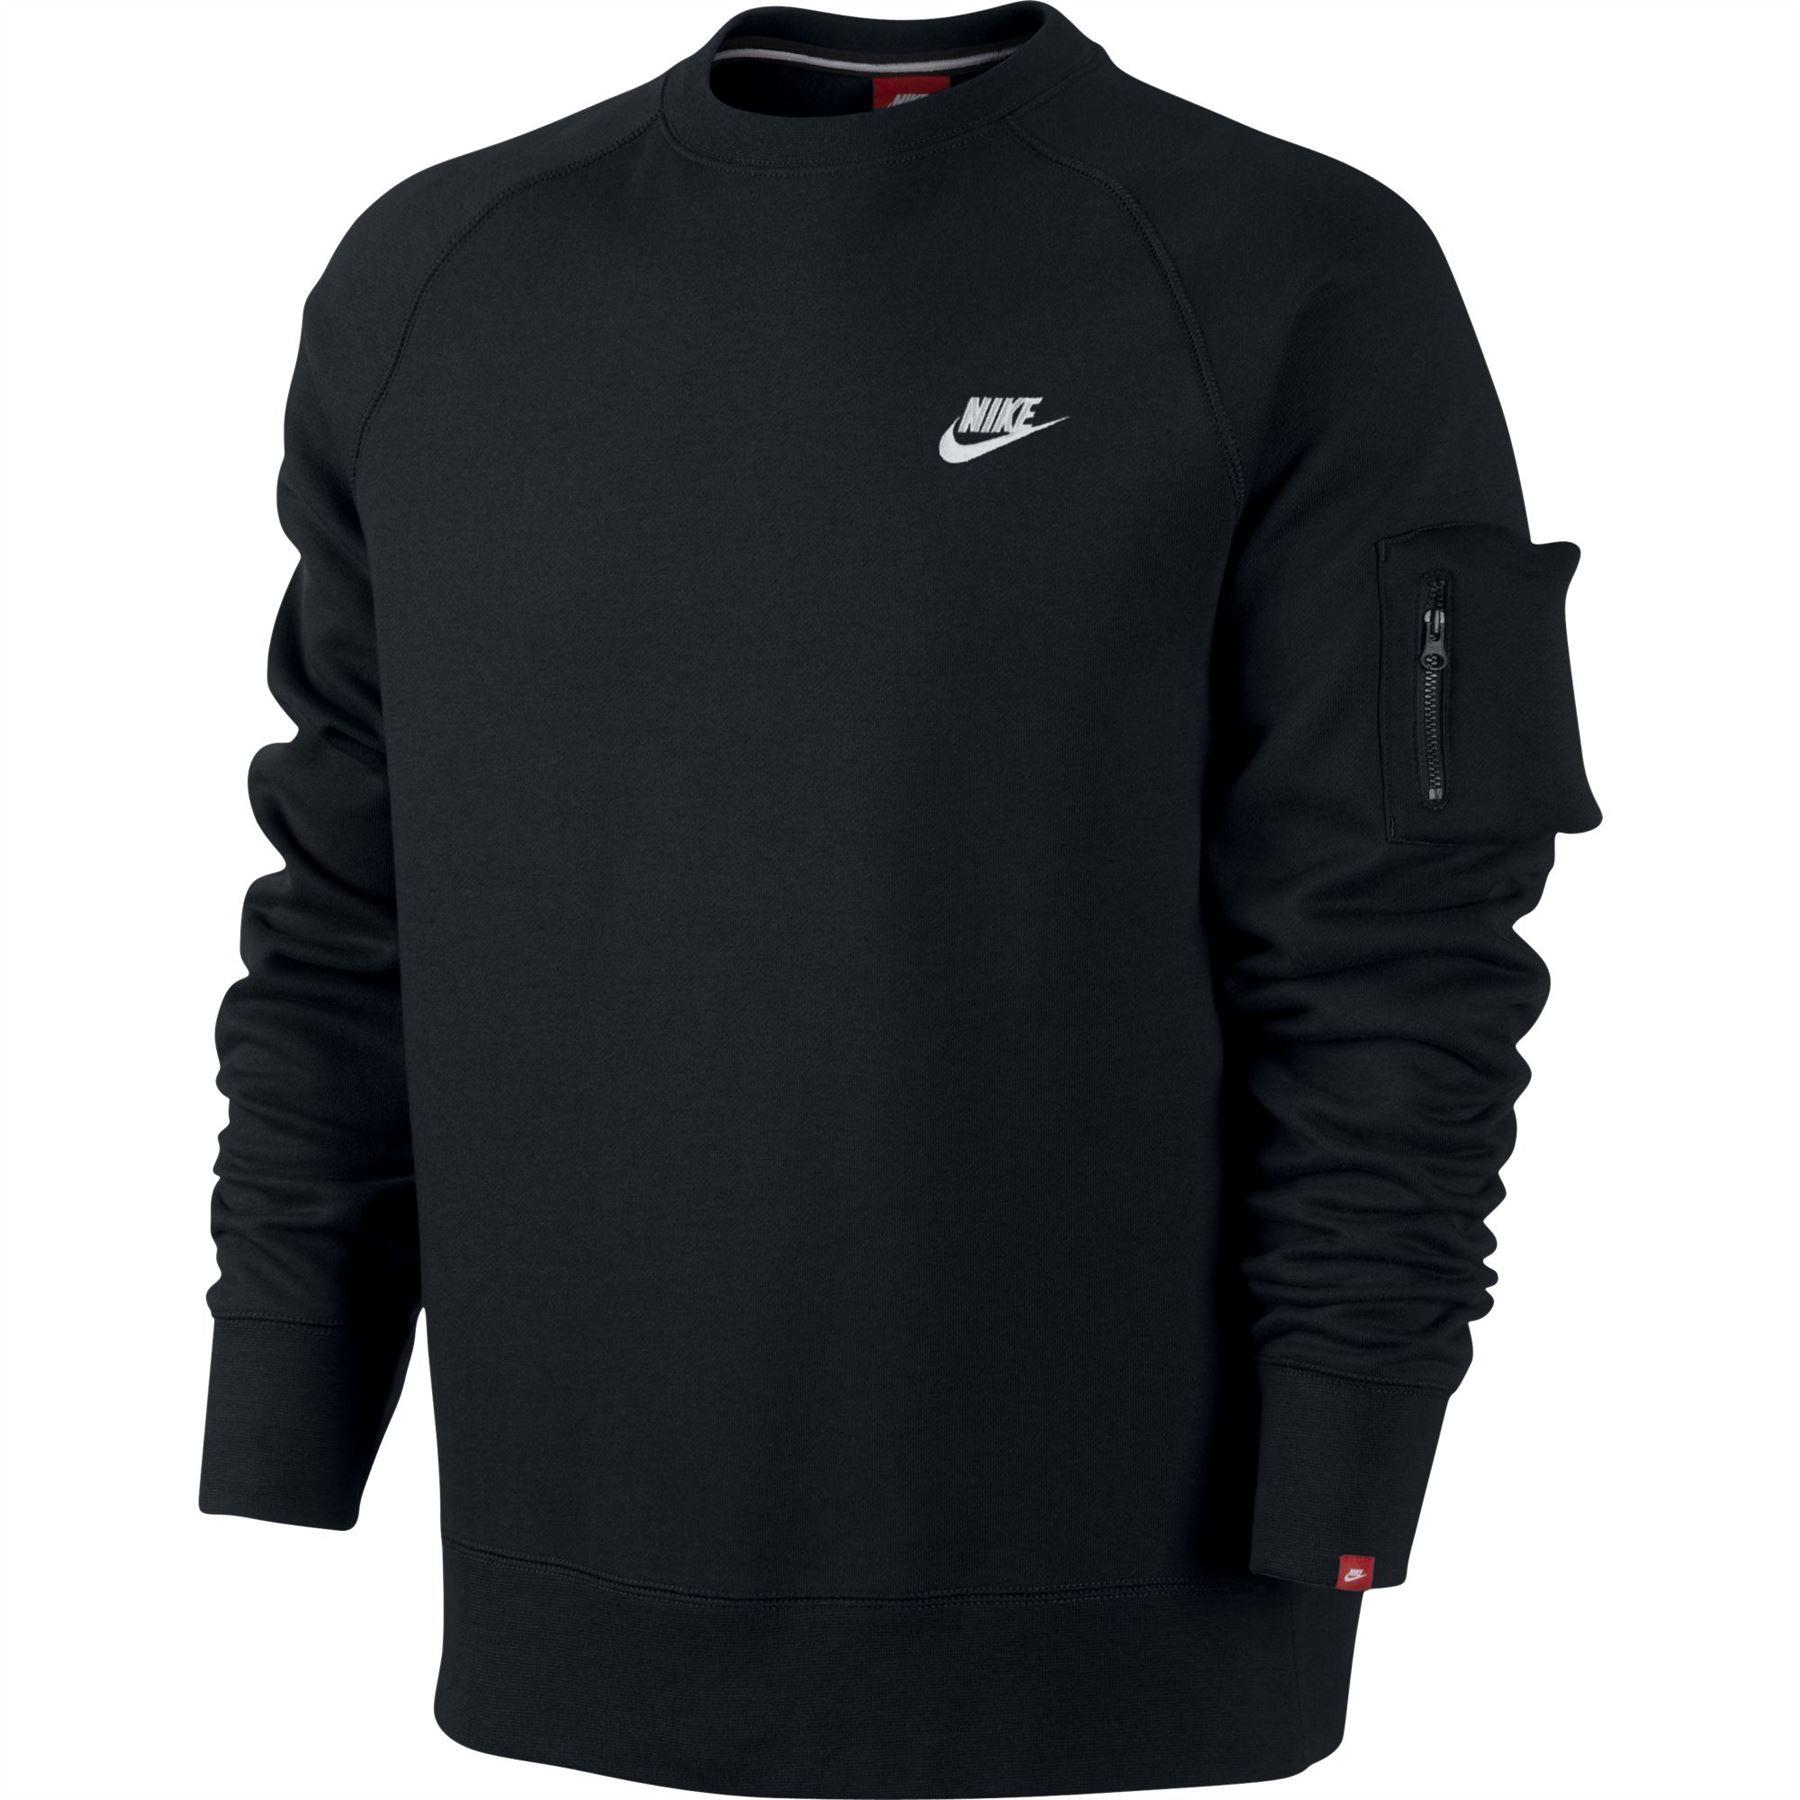 Nike Jumpers